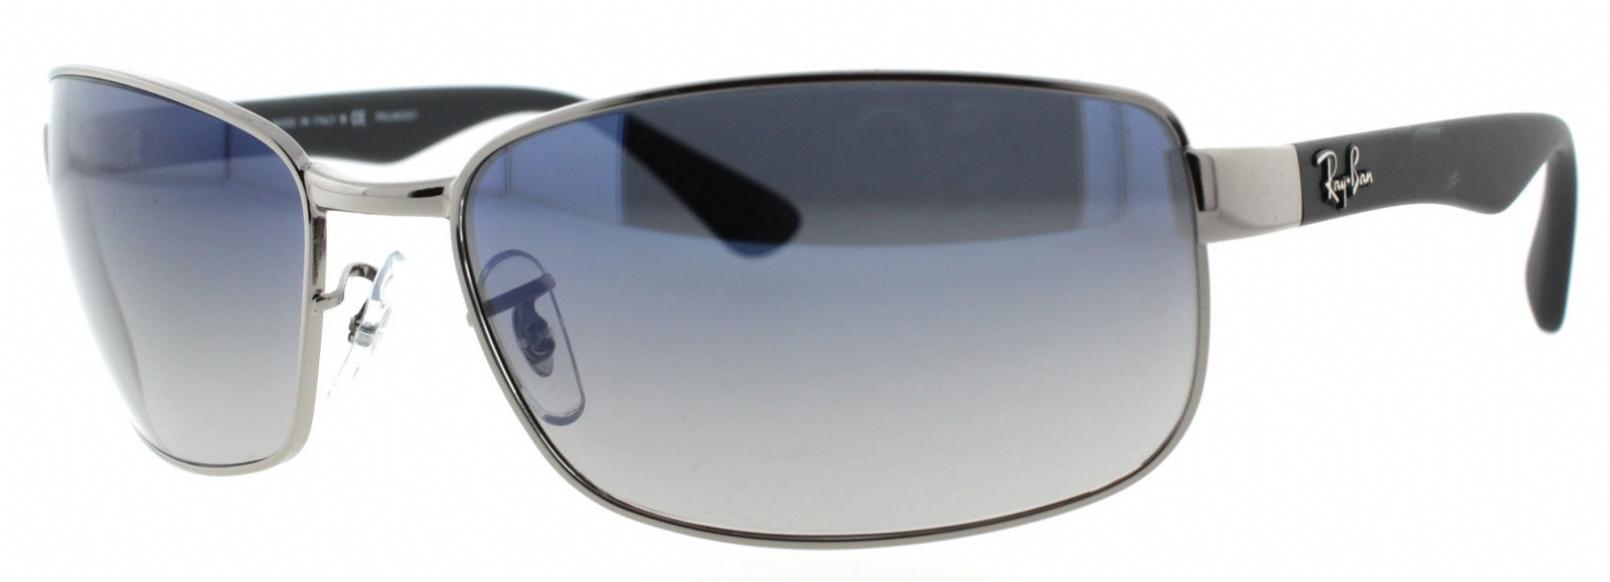 c8e85c46340 Sunglass Lens Replacement Ray Ban « Heritage Malta